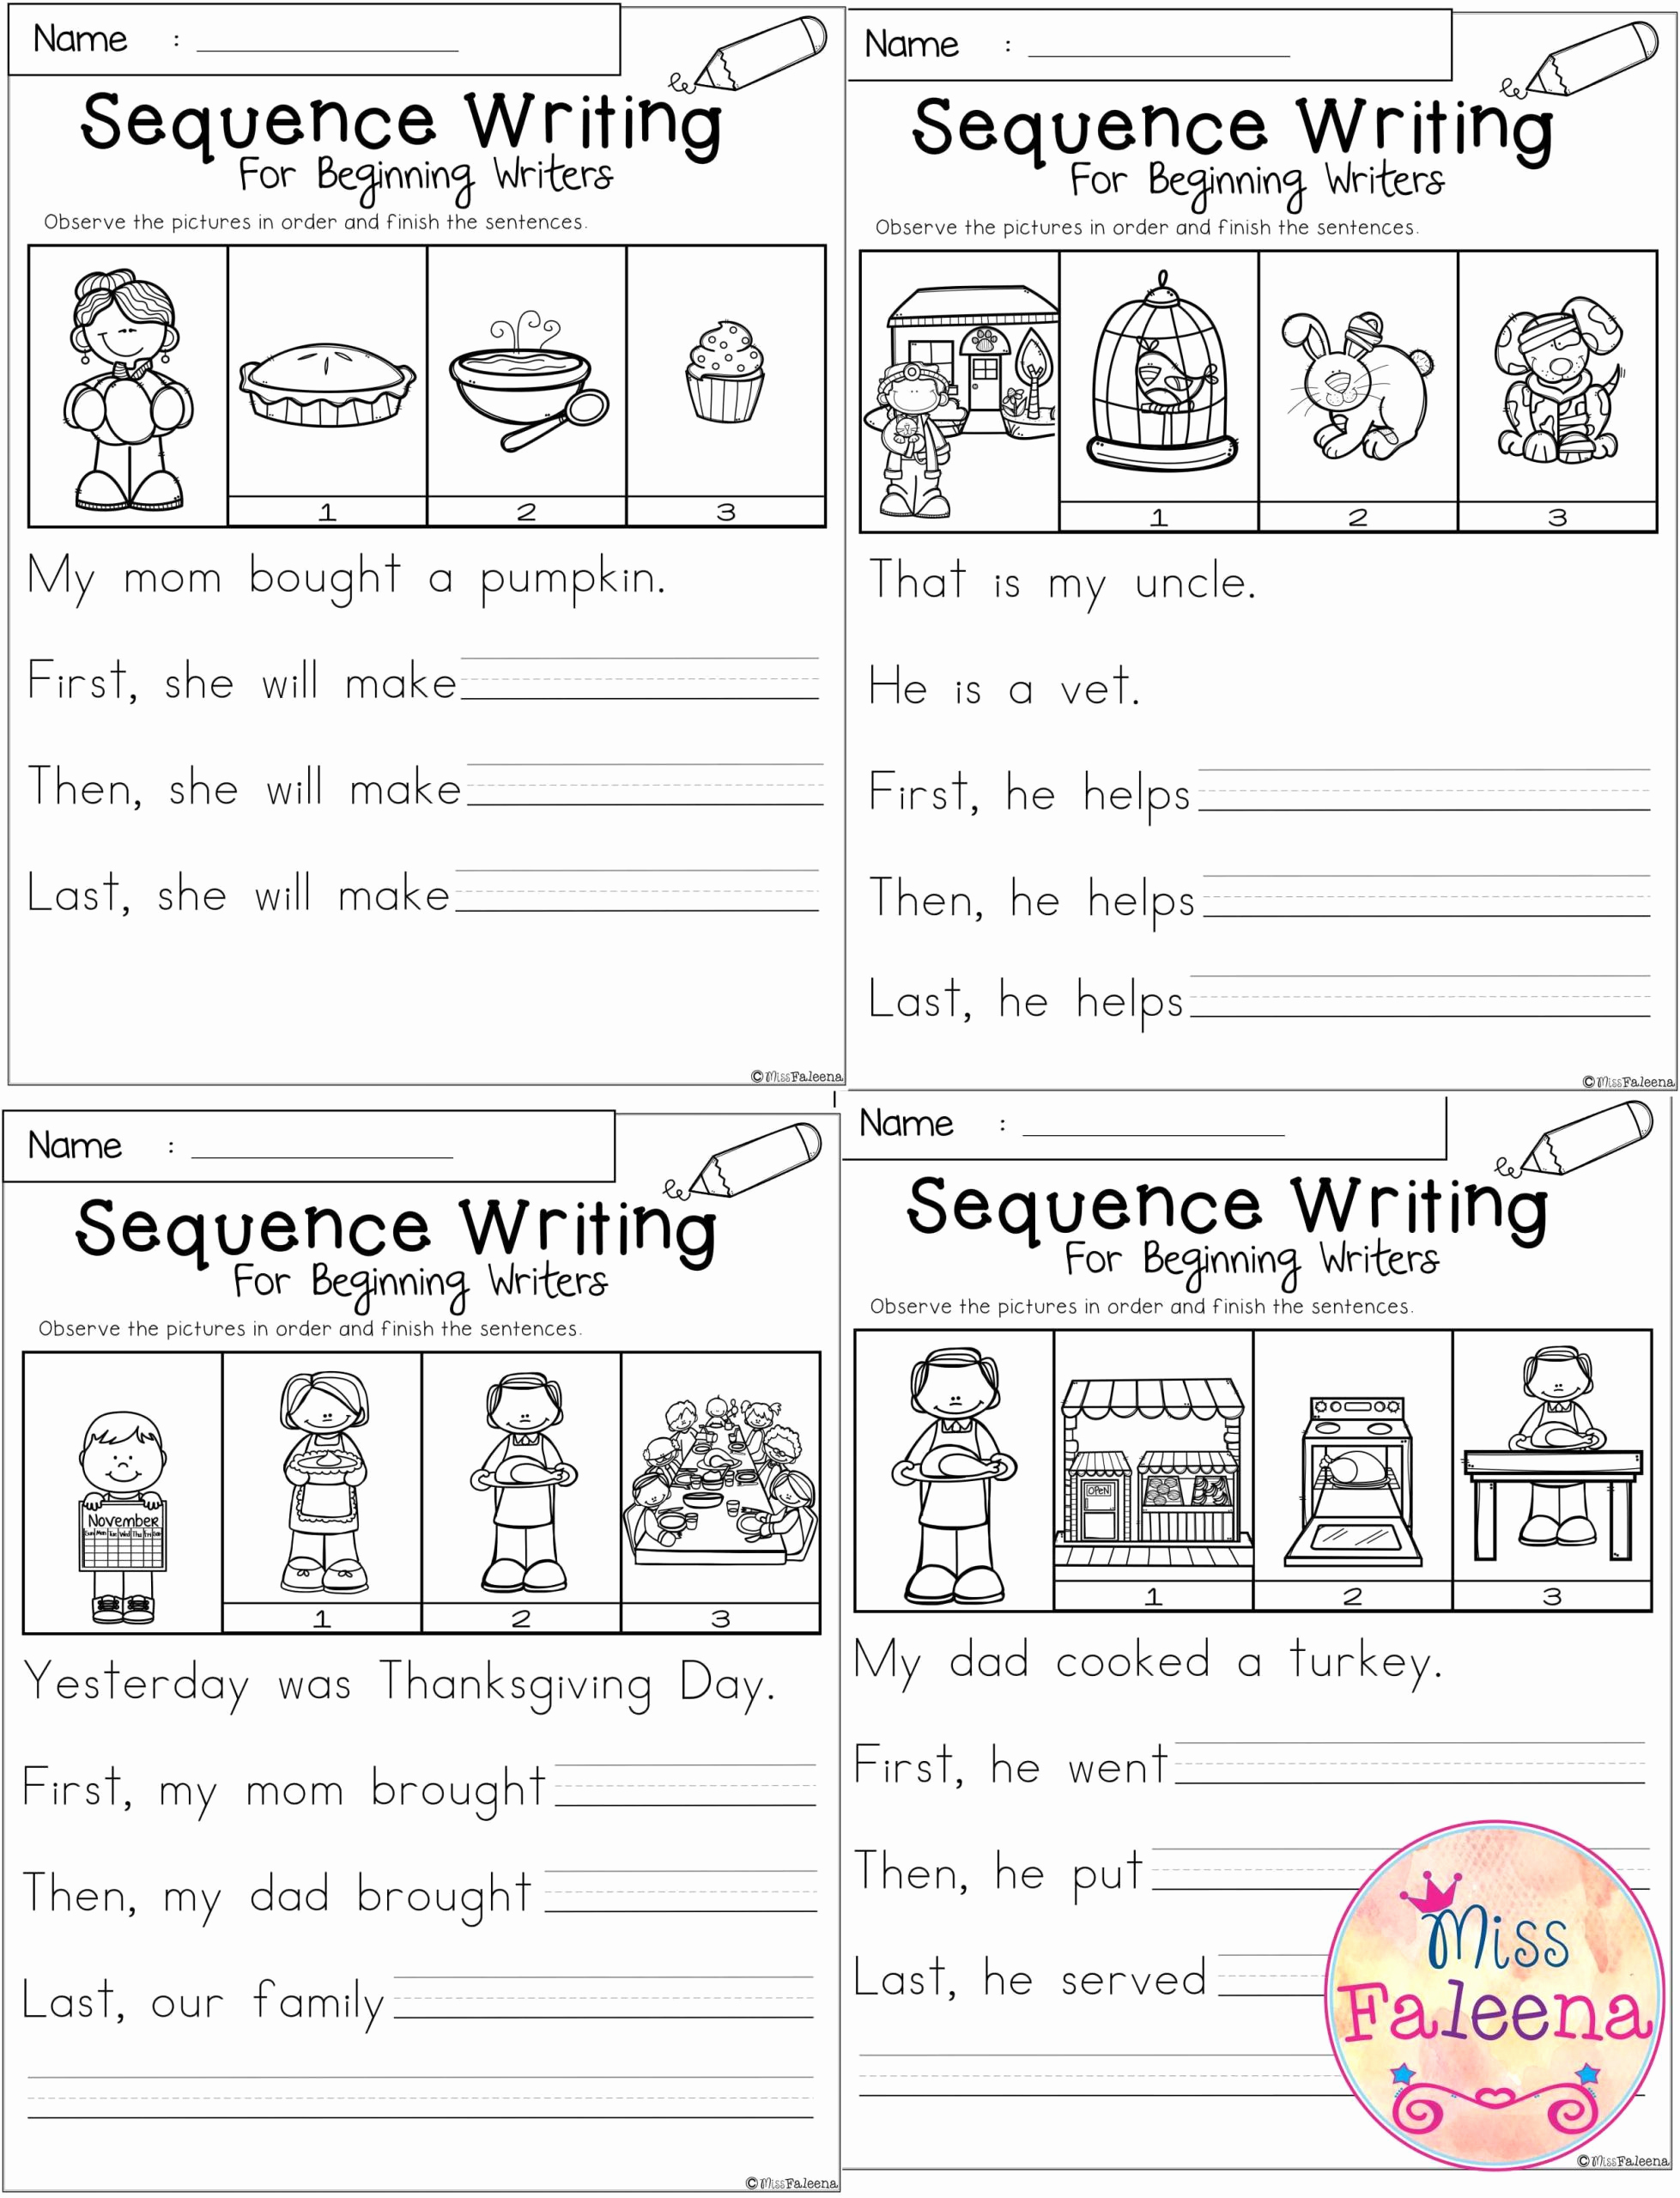 Sequence Worksheets for Kids Beautiful 20 Sequencing Worksheets for Kindergarten